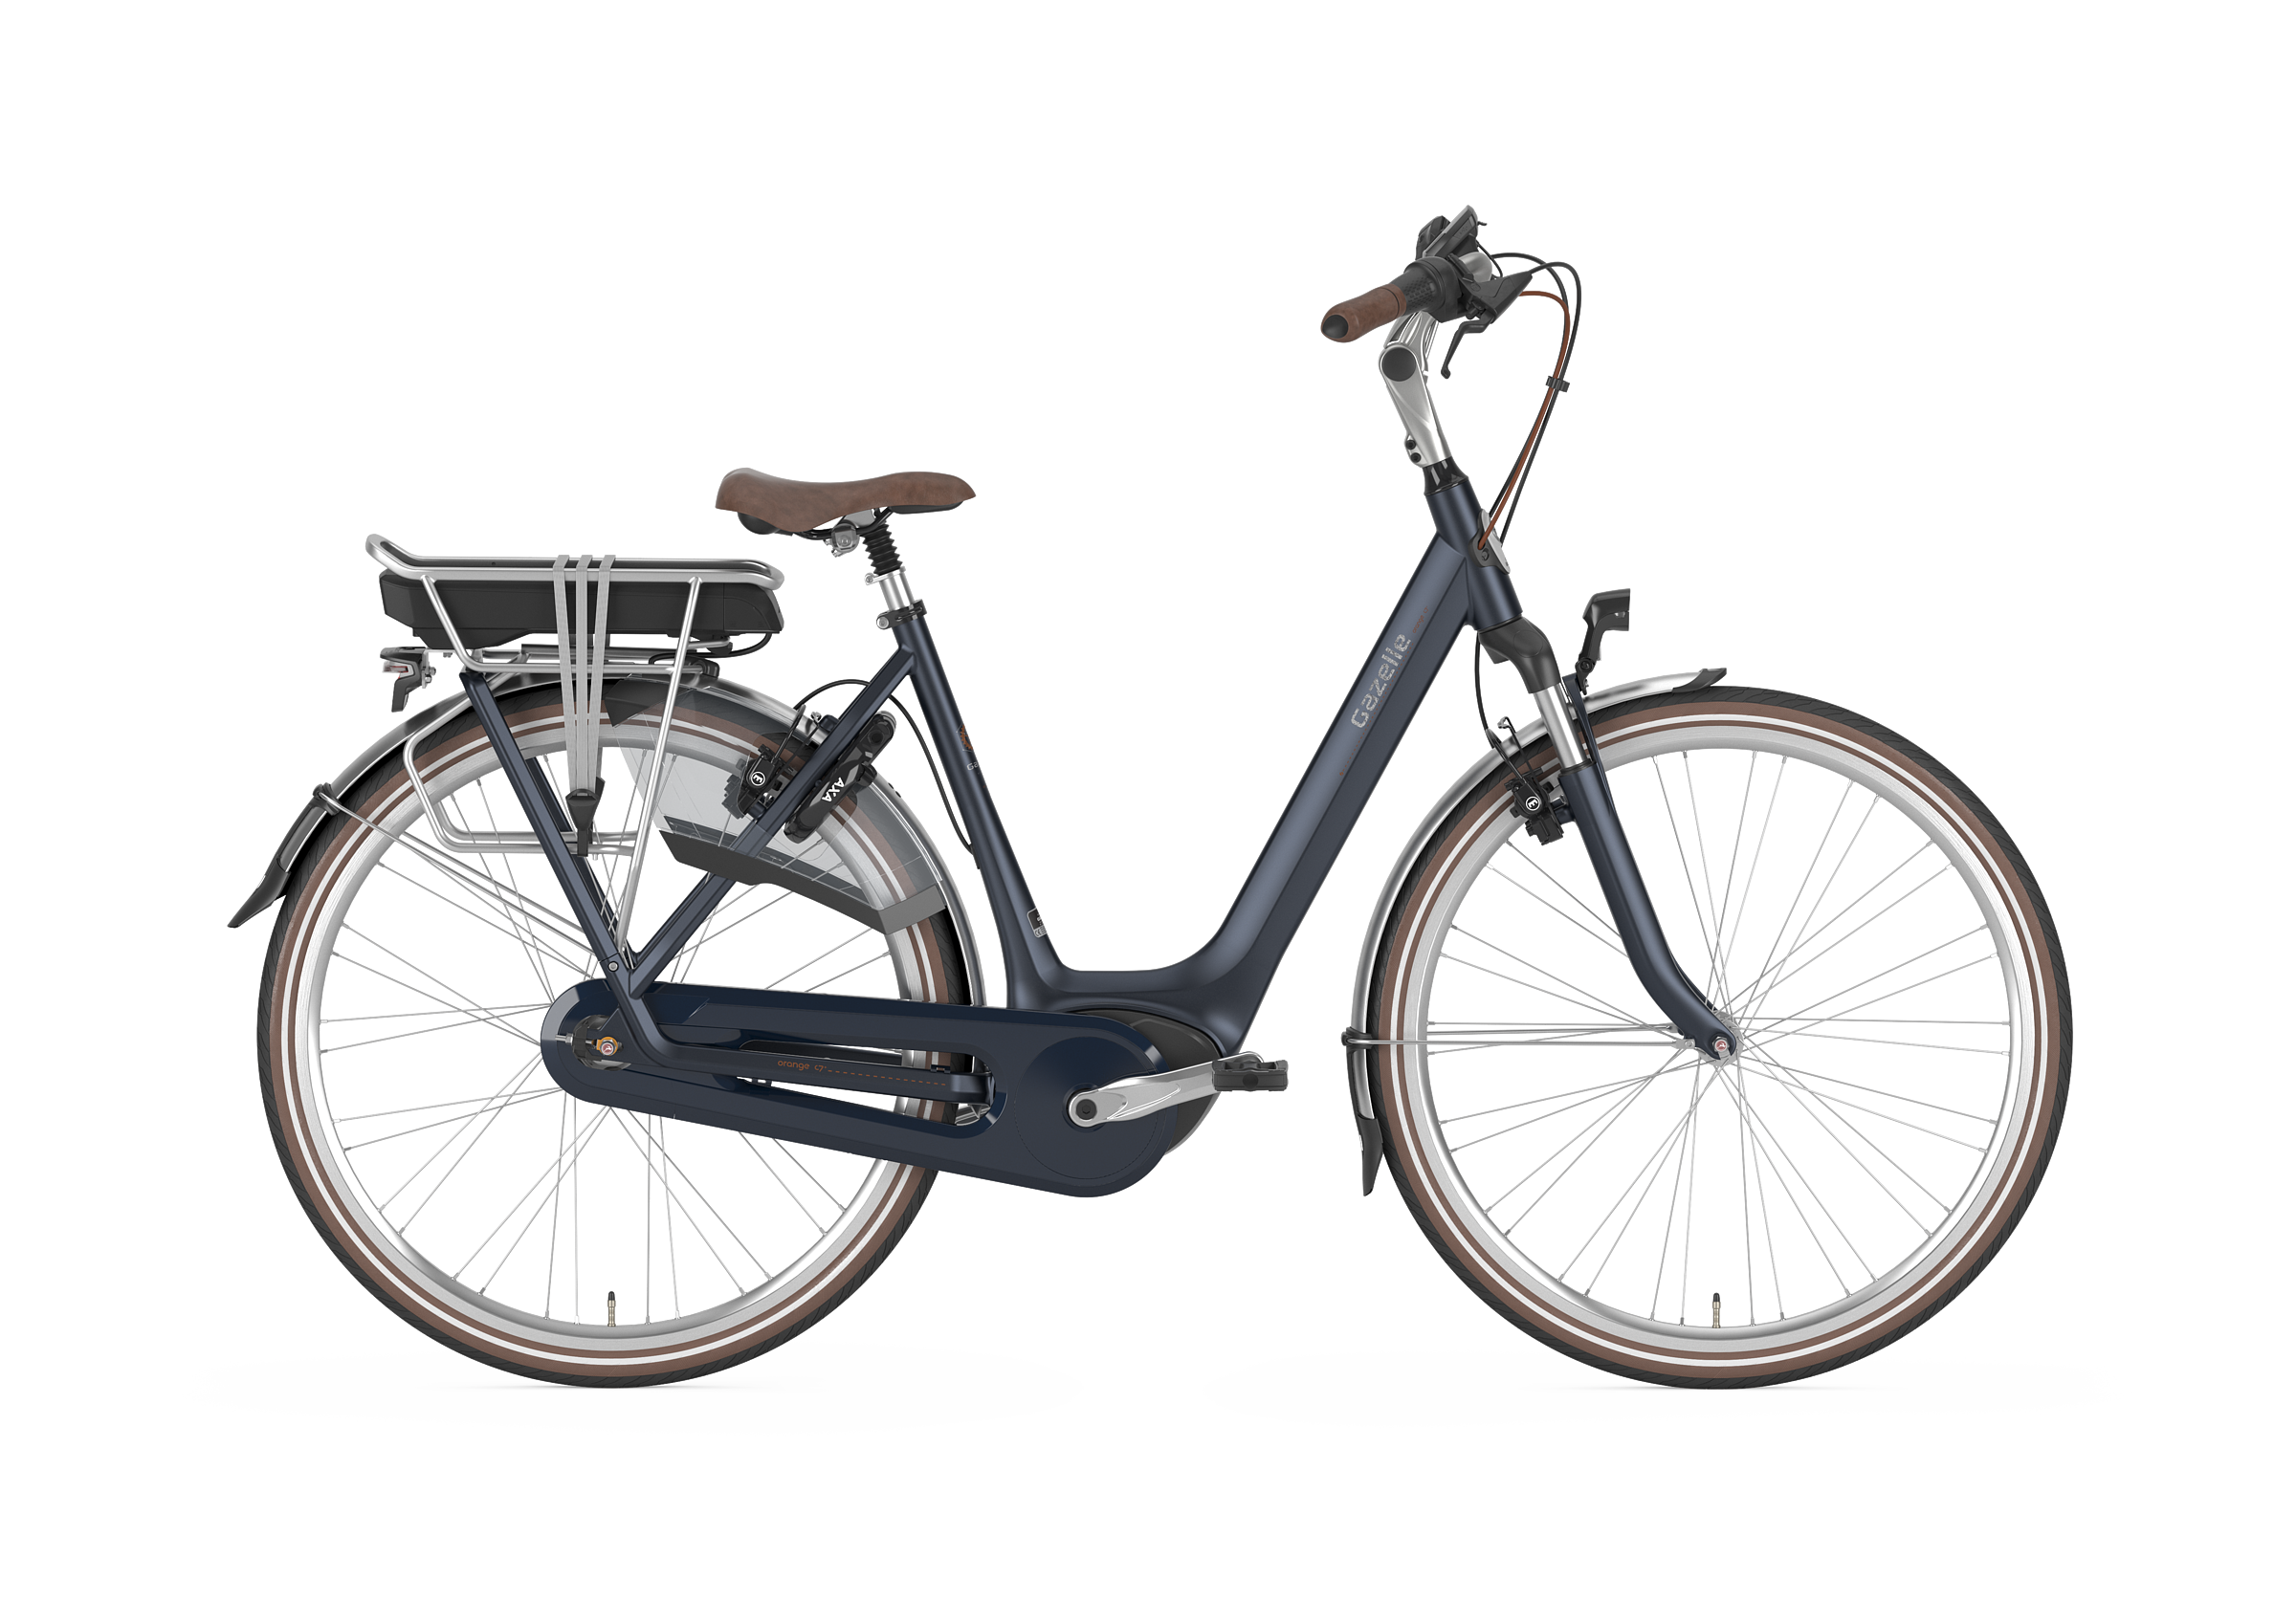 gazelle e bike kopen e bike specialist ronald schot. Black Bedroom Furniture Sets. Home Design Ideas